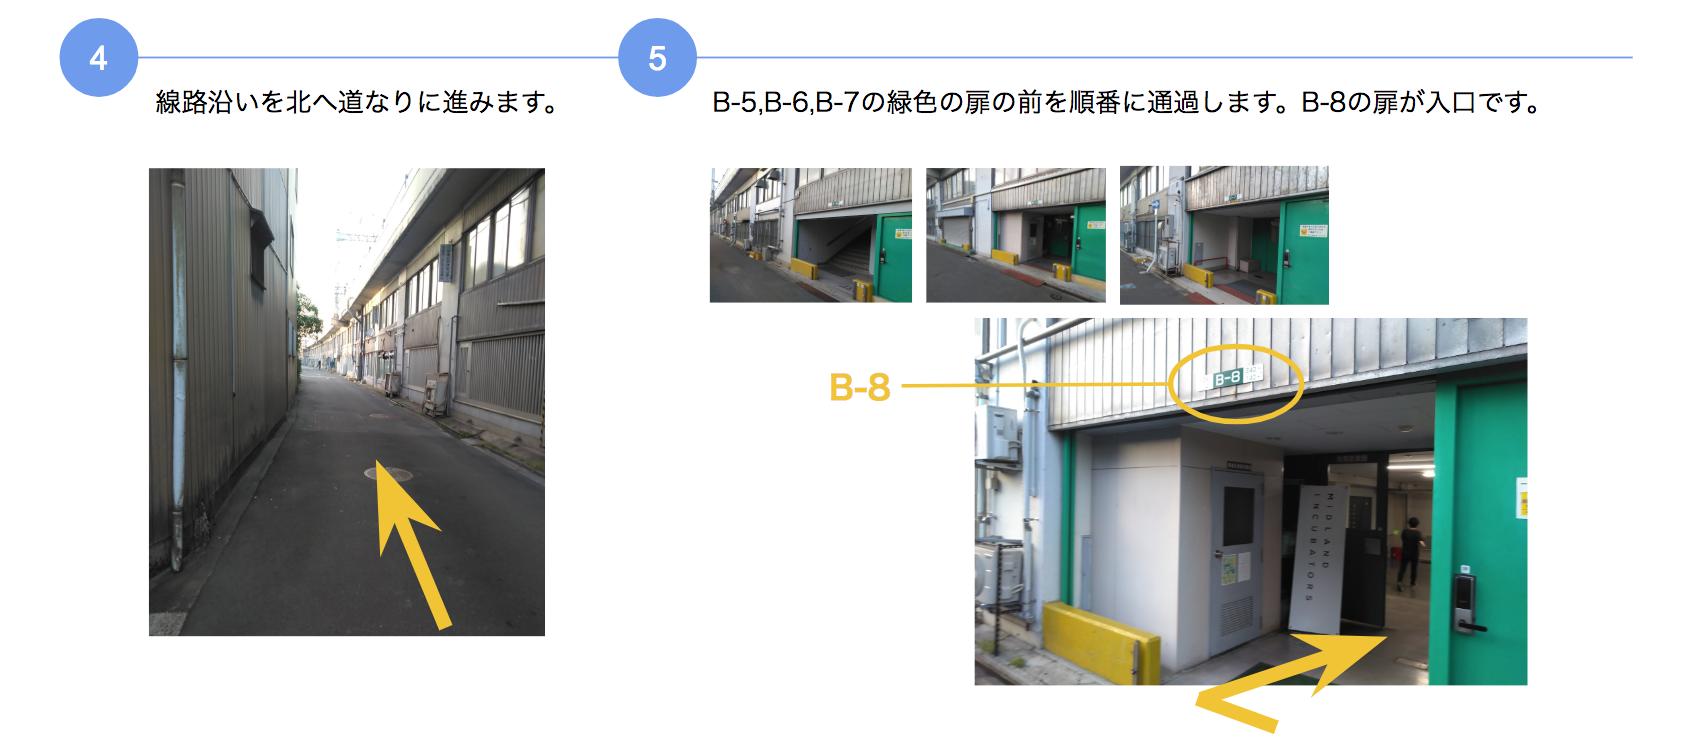 f:id:toyoshi:20180619161024p:plain